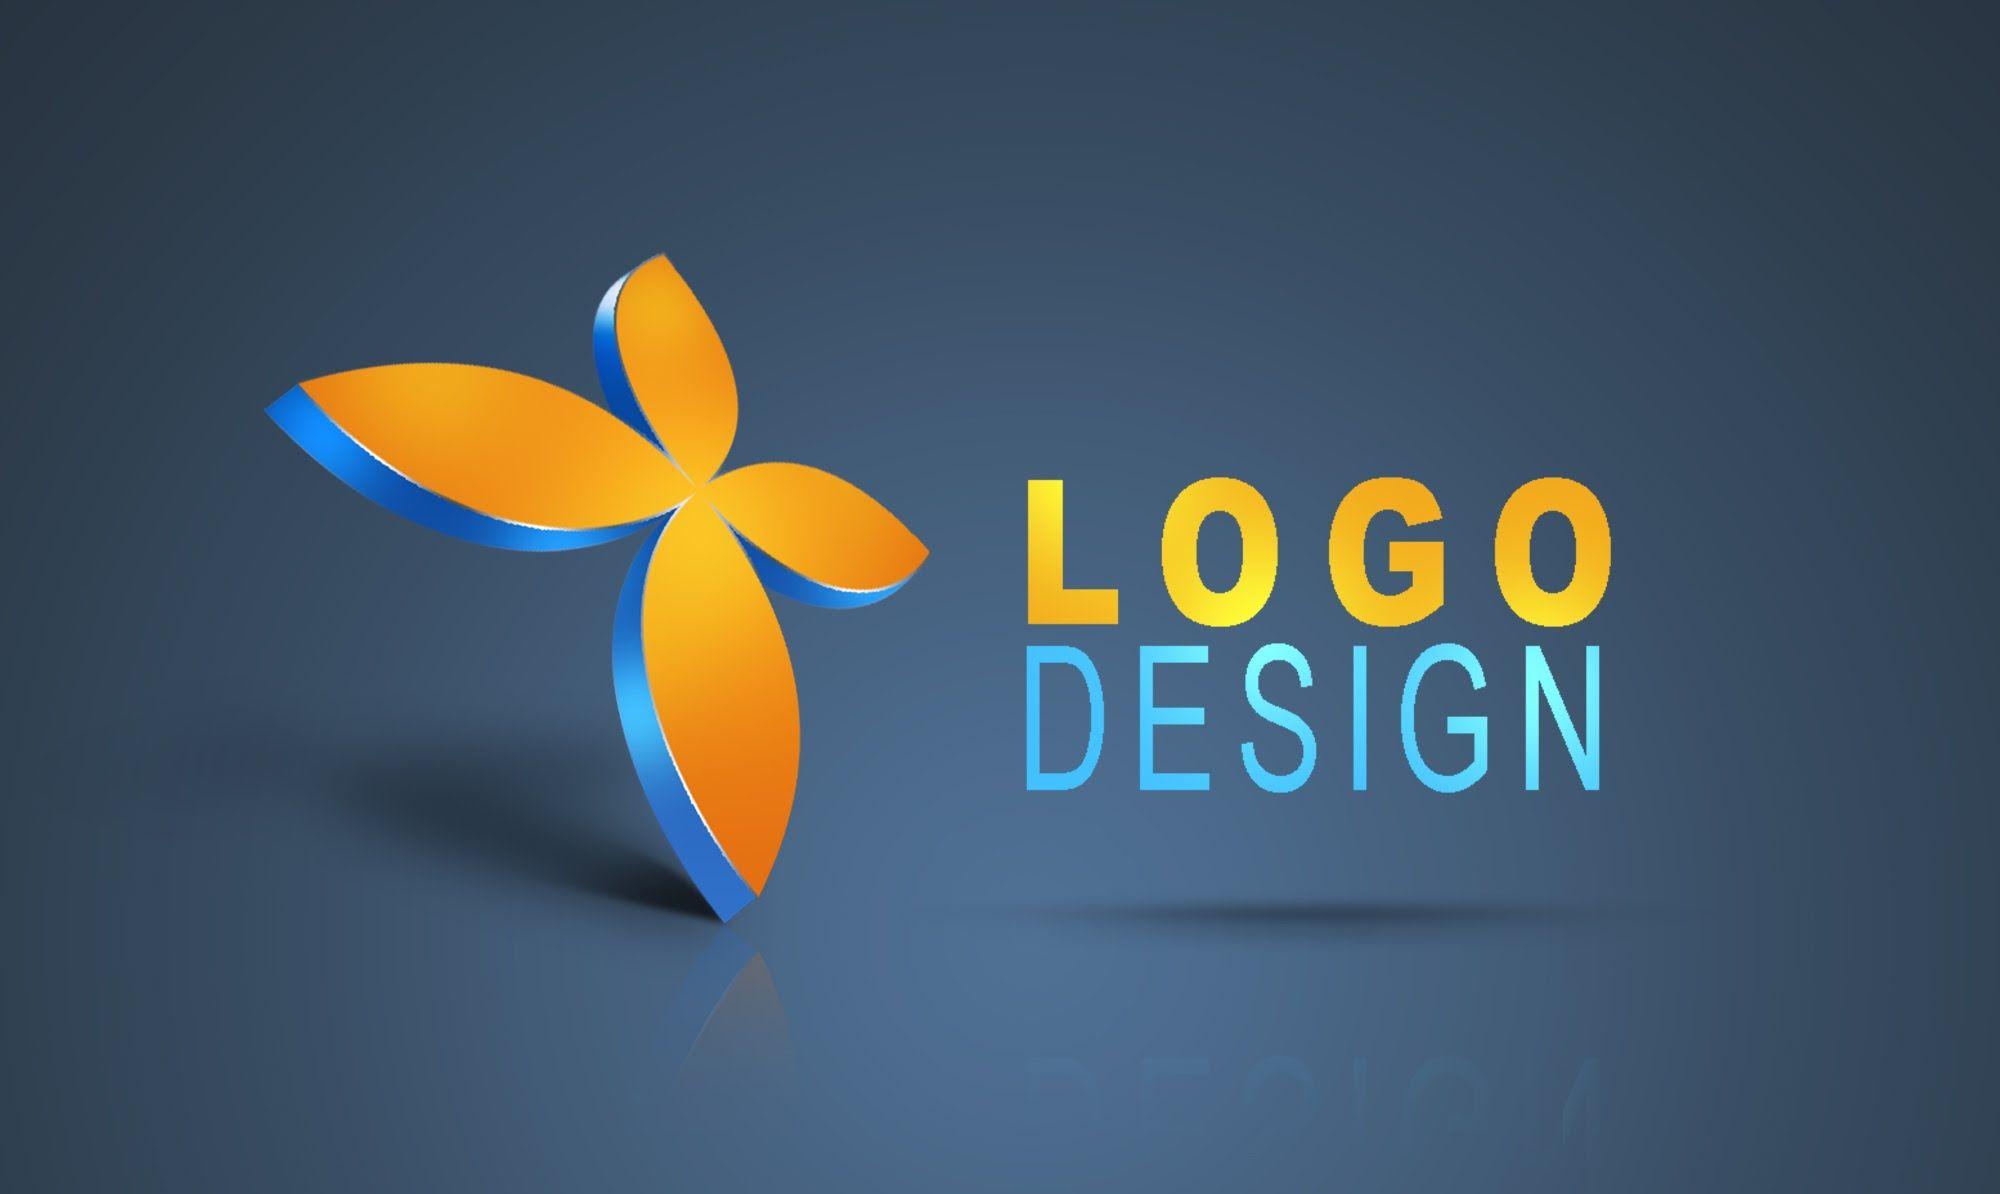 3d logo design in photoshop hindi urdu tutorial videos 3d logo design in photoshop hindi urdu tutorial baditri Gallery